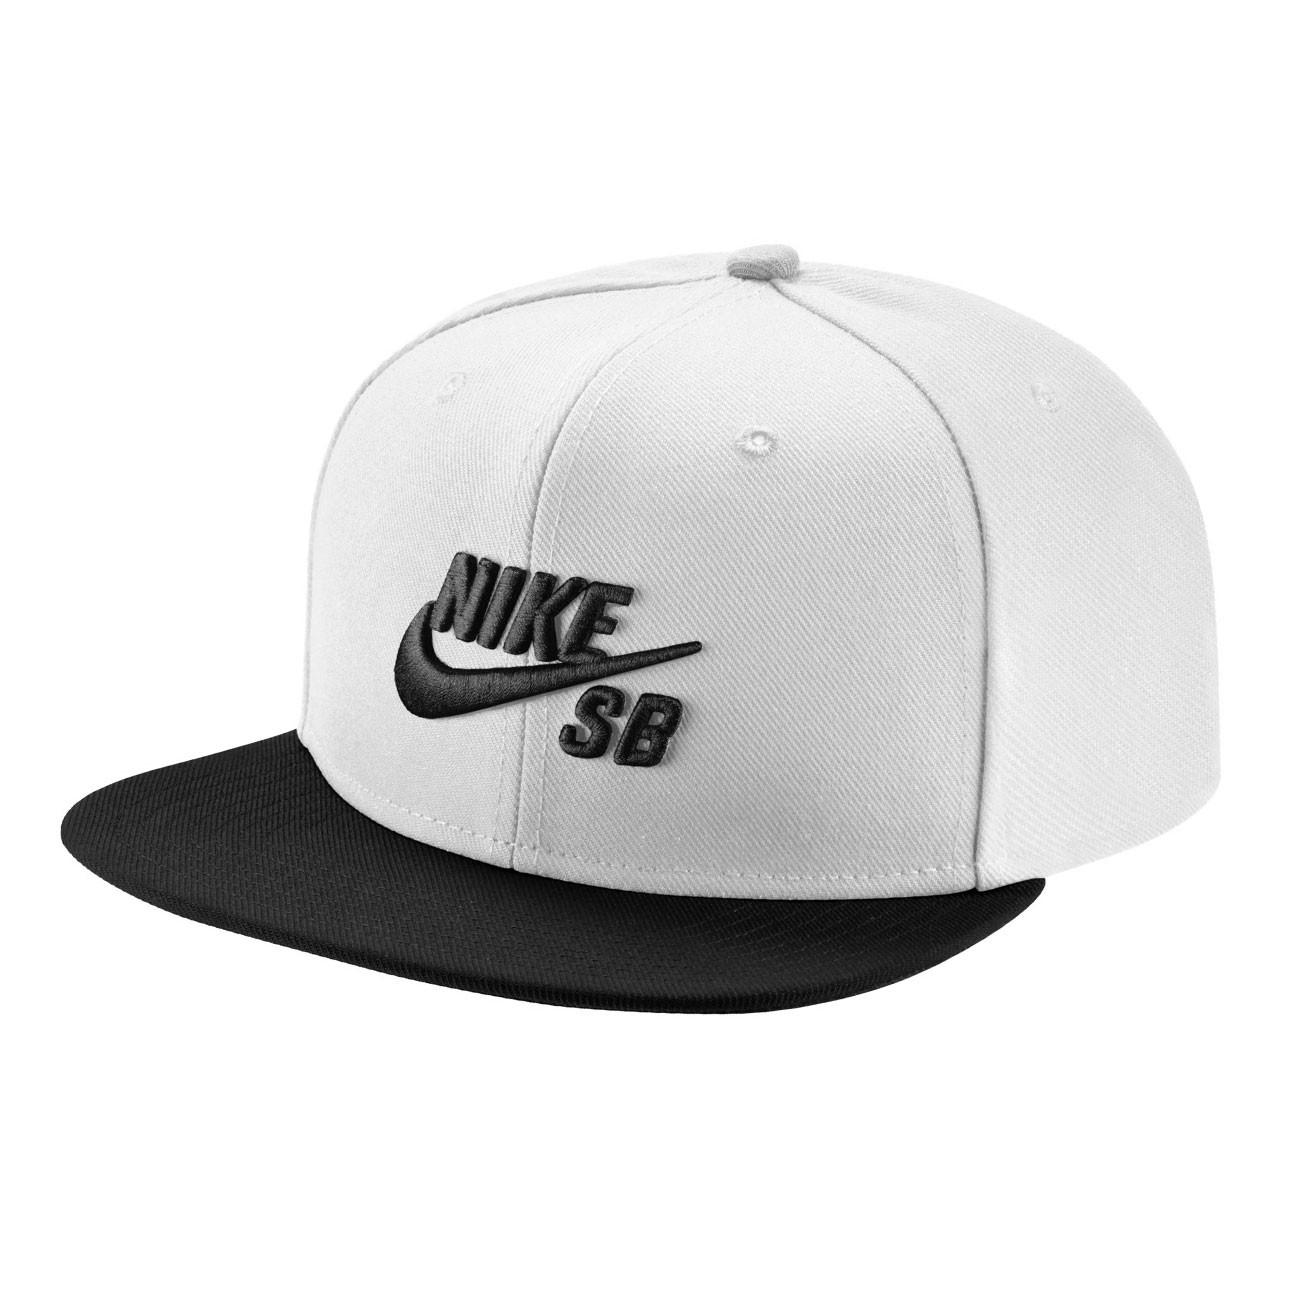 Kšiltovka Nike SB Pro white black black black  2999853aad